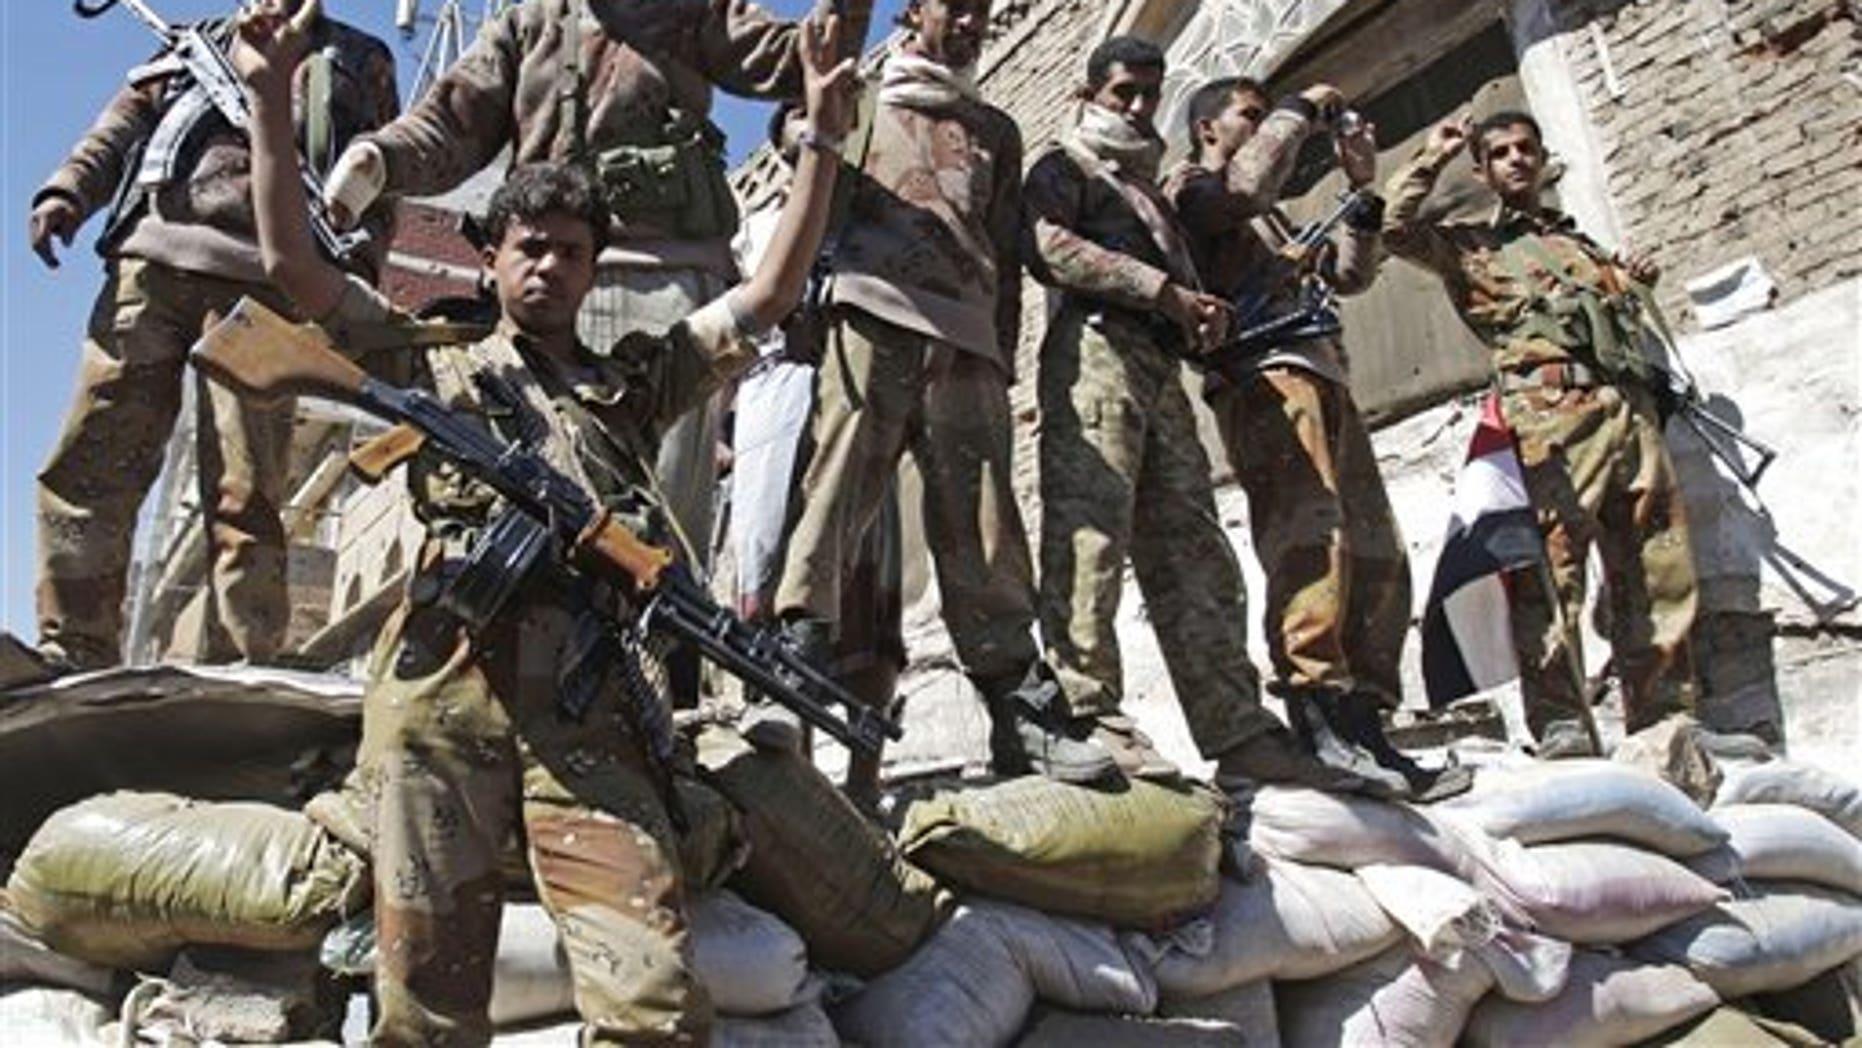 Dec. 25: Yemeni defected army soldiers gesture at protesters marching to demand the prosecution of Yemen's President Ali Abdullah Saleh in Sanaa, Yemen.